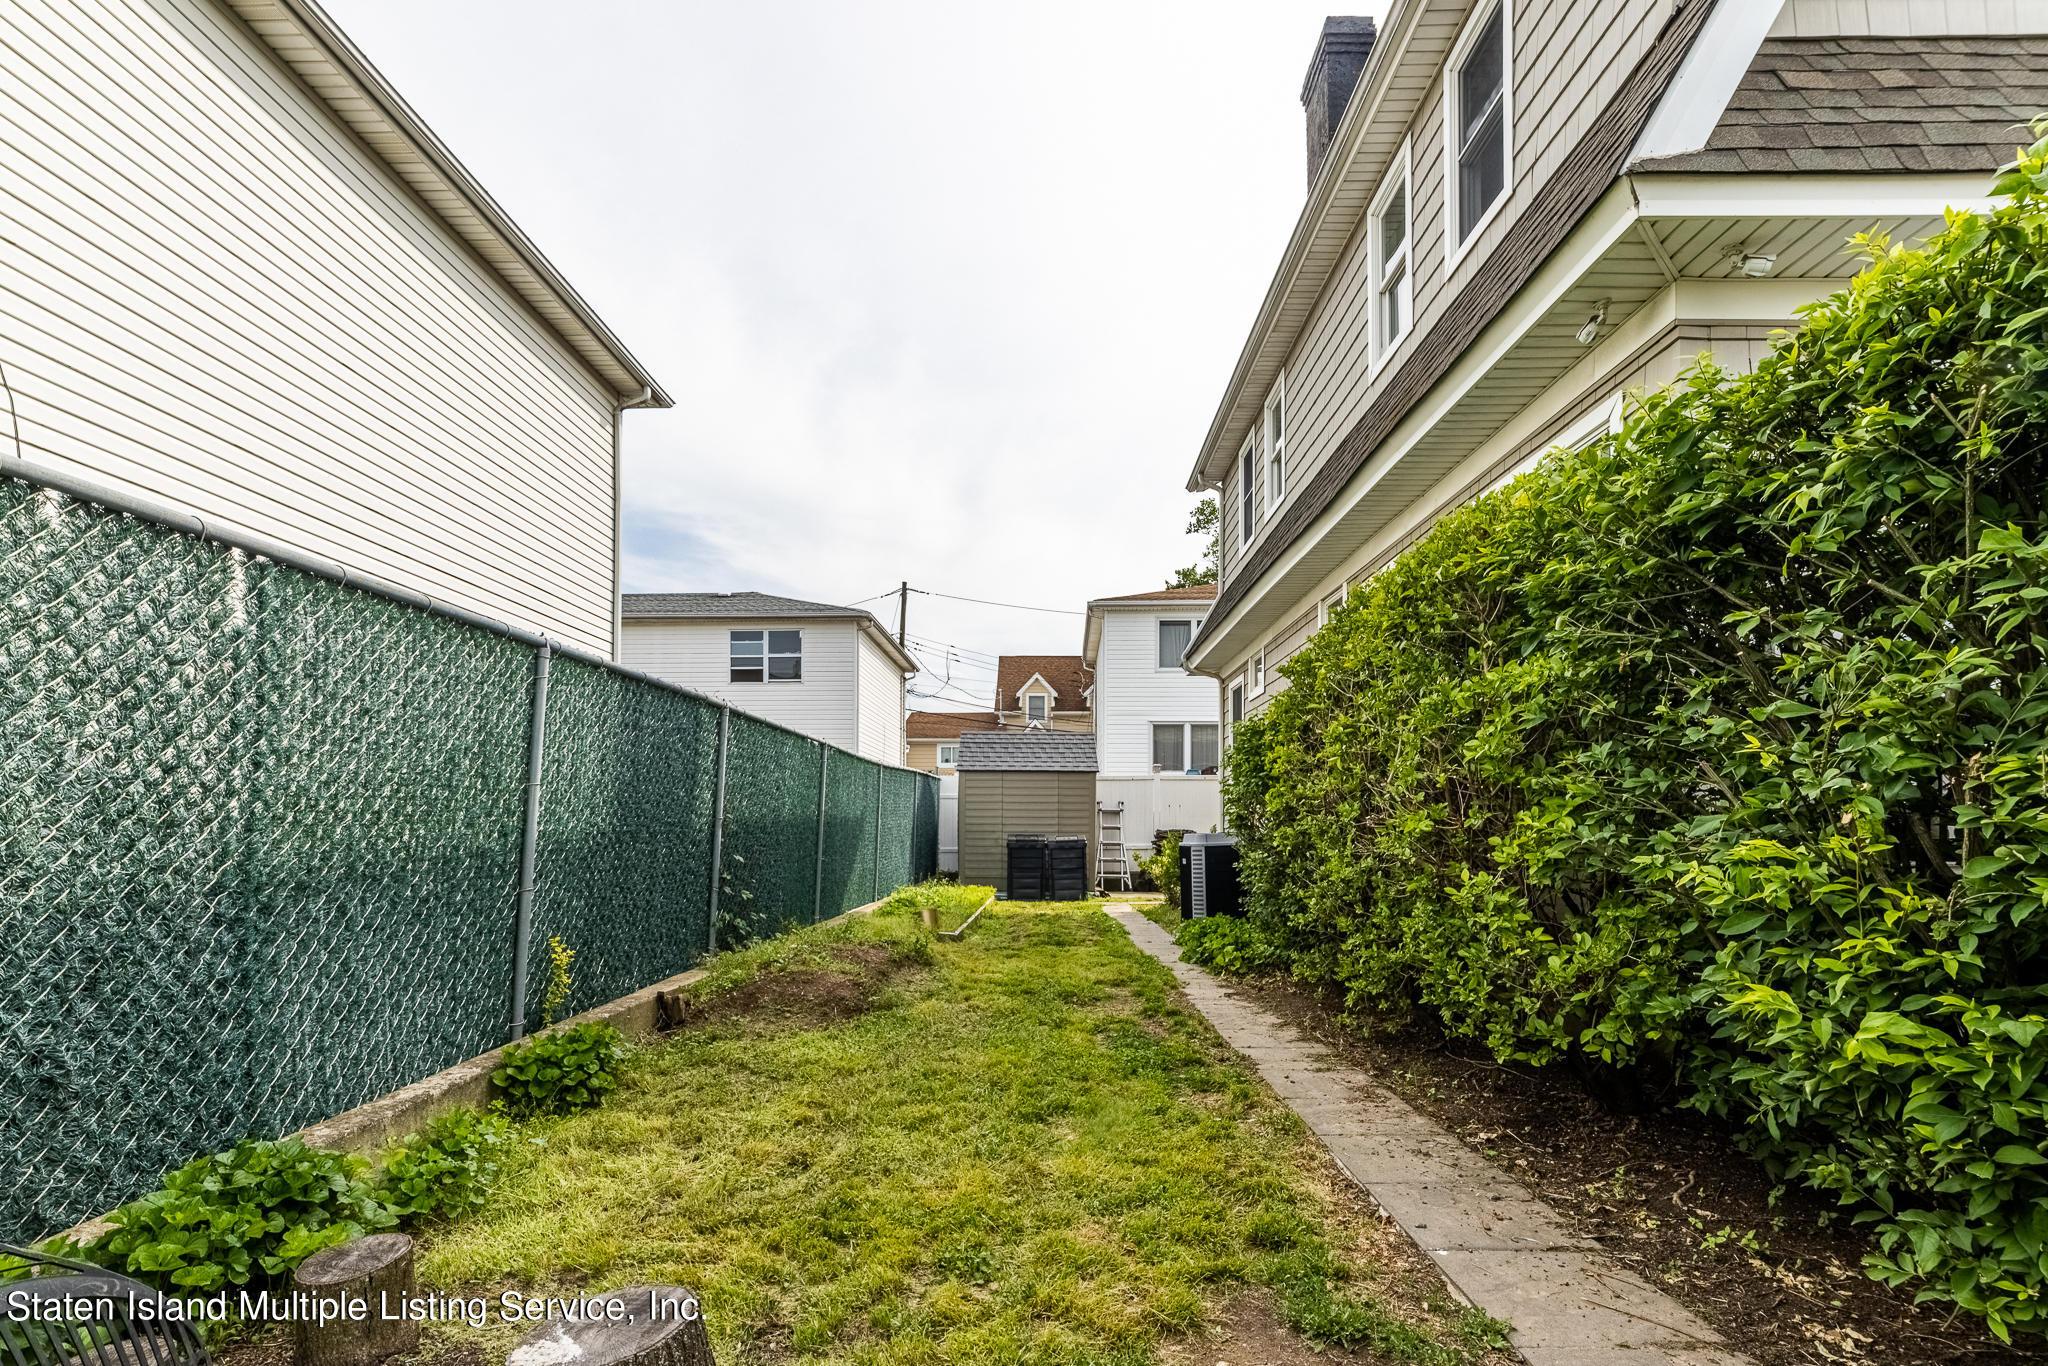 Single Family - Detached 790 New Dorp Lane  Staten Island, NY 10306, MLS-1146574-31